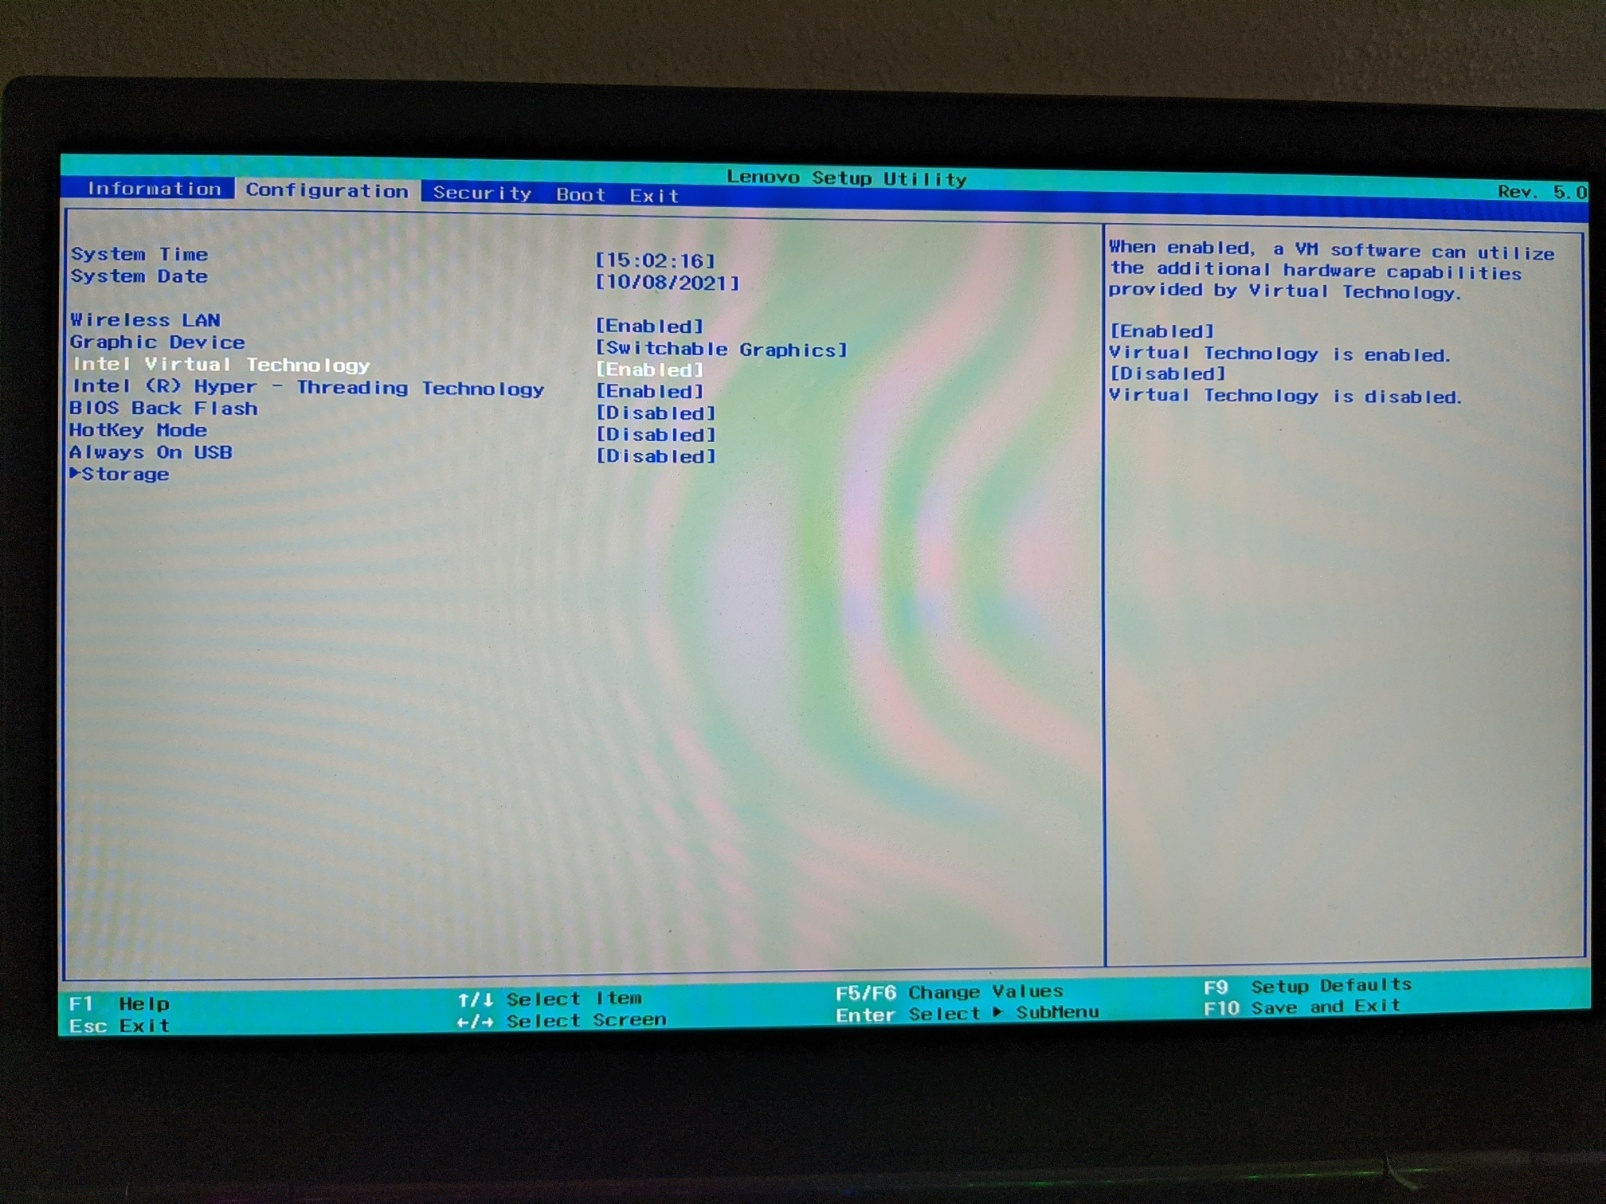 Intel Virtual Technology